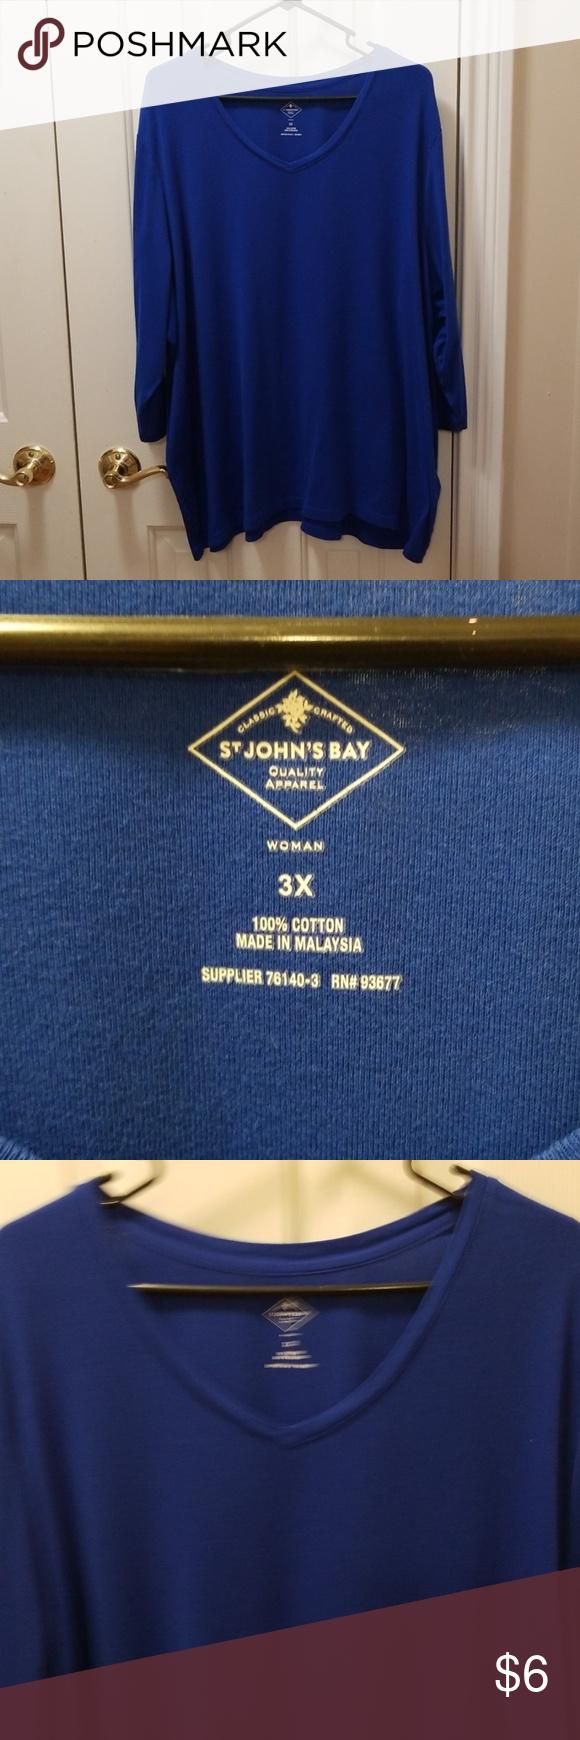 John/'s Bay Women/'s Scoop Neck Tank Top Size Medium Precio Blue 100/% Cotton St